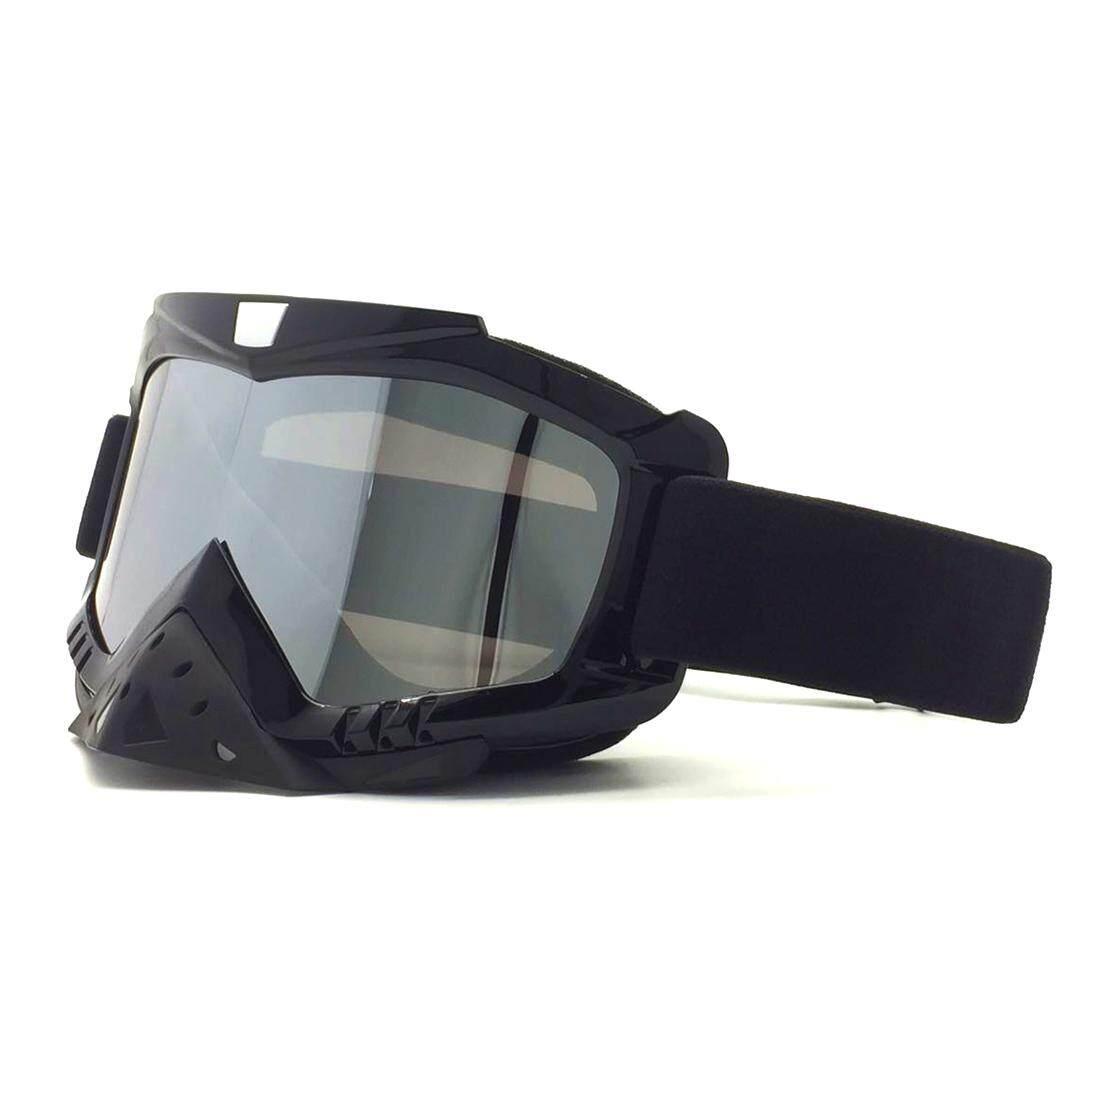 360 Wish Sepeda Motor Luar Jalan Helm Bersepeda Kacamata Tahan Angin Pelindung Mata Kacamata Hitam Ski Terang Hitam Bingkai + Perak Piringan Lensa-Intl